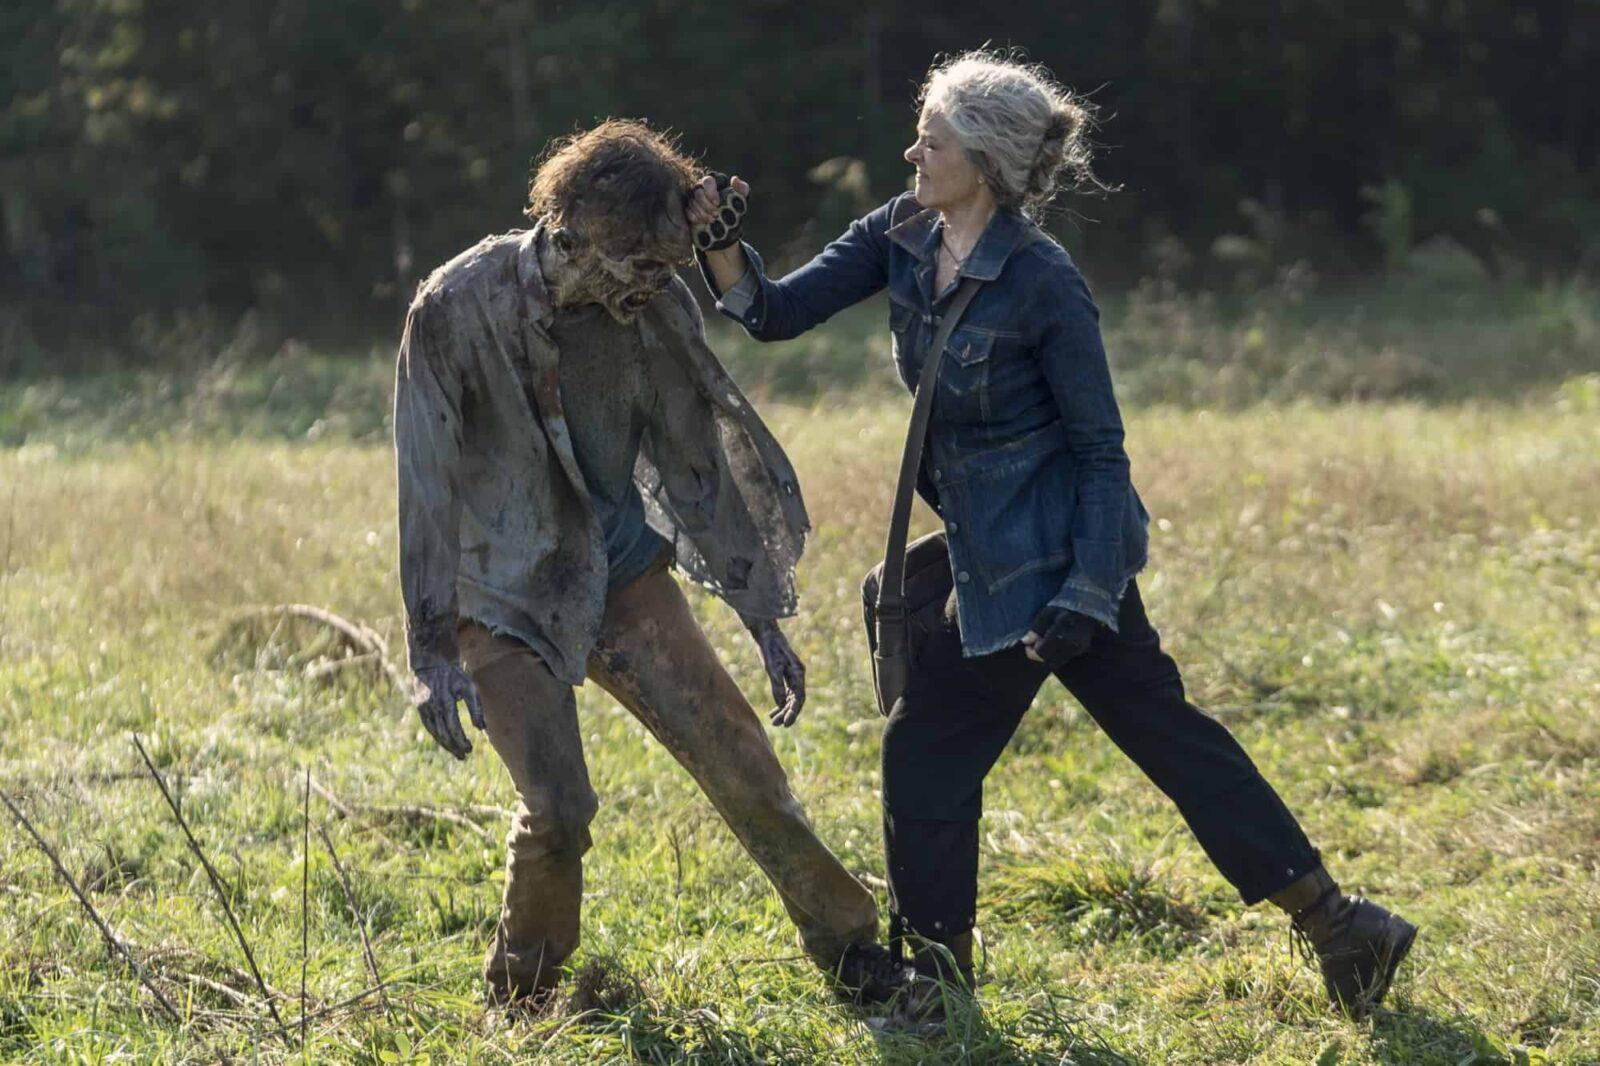 Carol (Melissa McBride) matando un caminante en The Walking Dead 10x21 Diverged